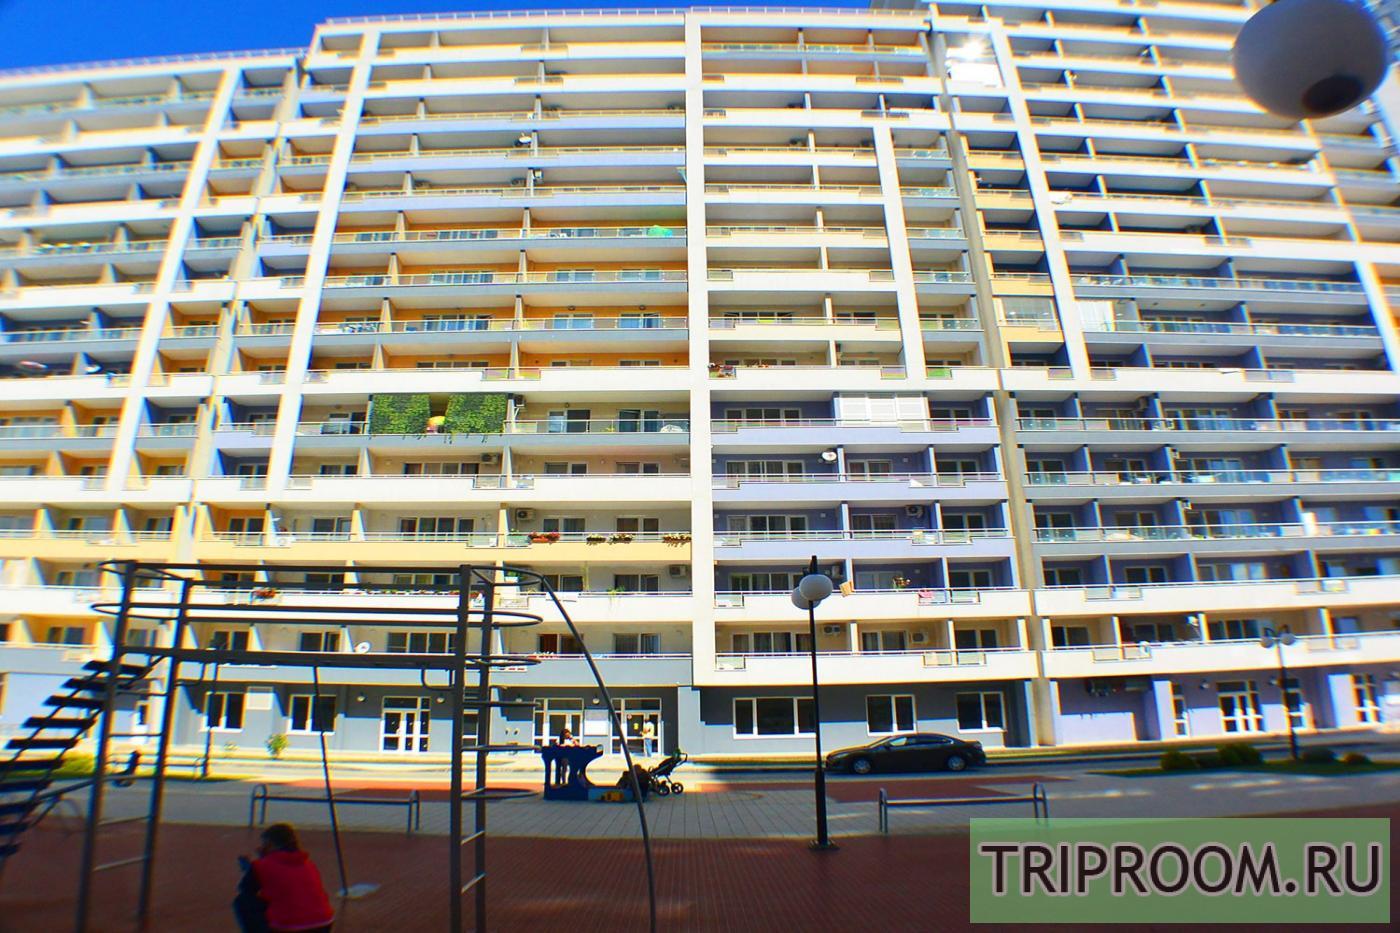 1-комнатная квартира посуточно (вариант № 26990), ул. Кирпичная улица, фото № 21